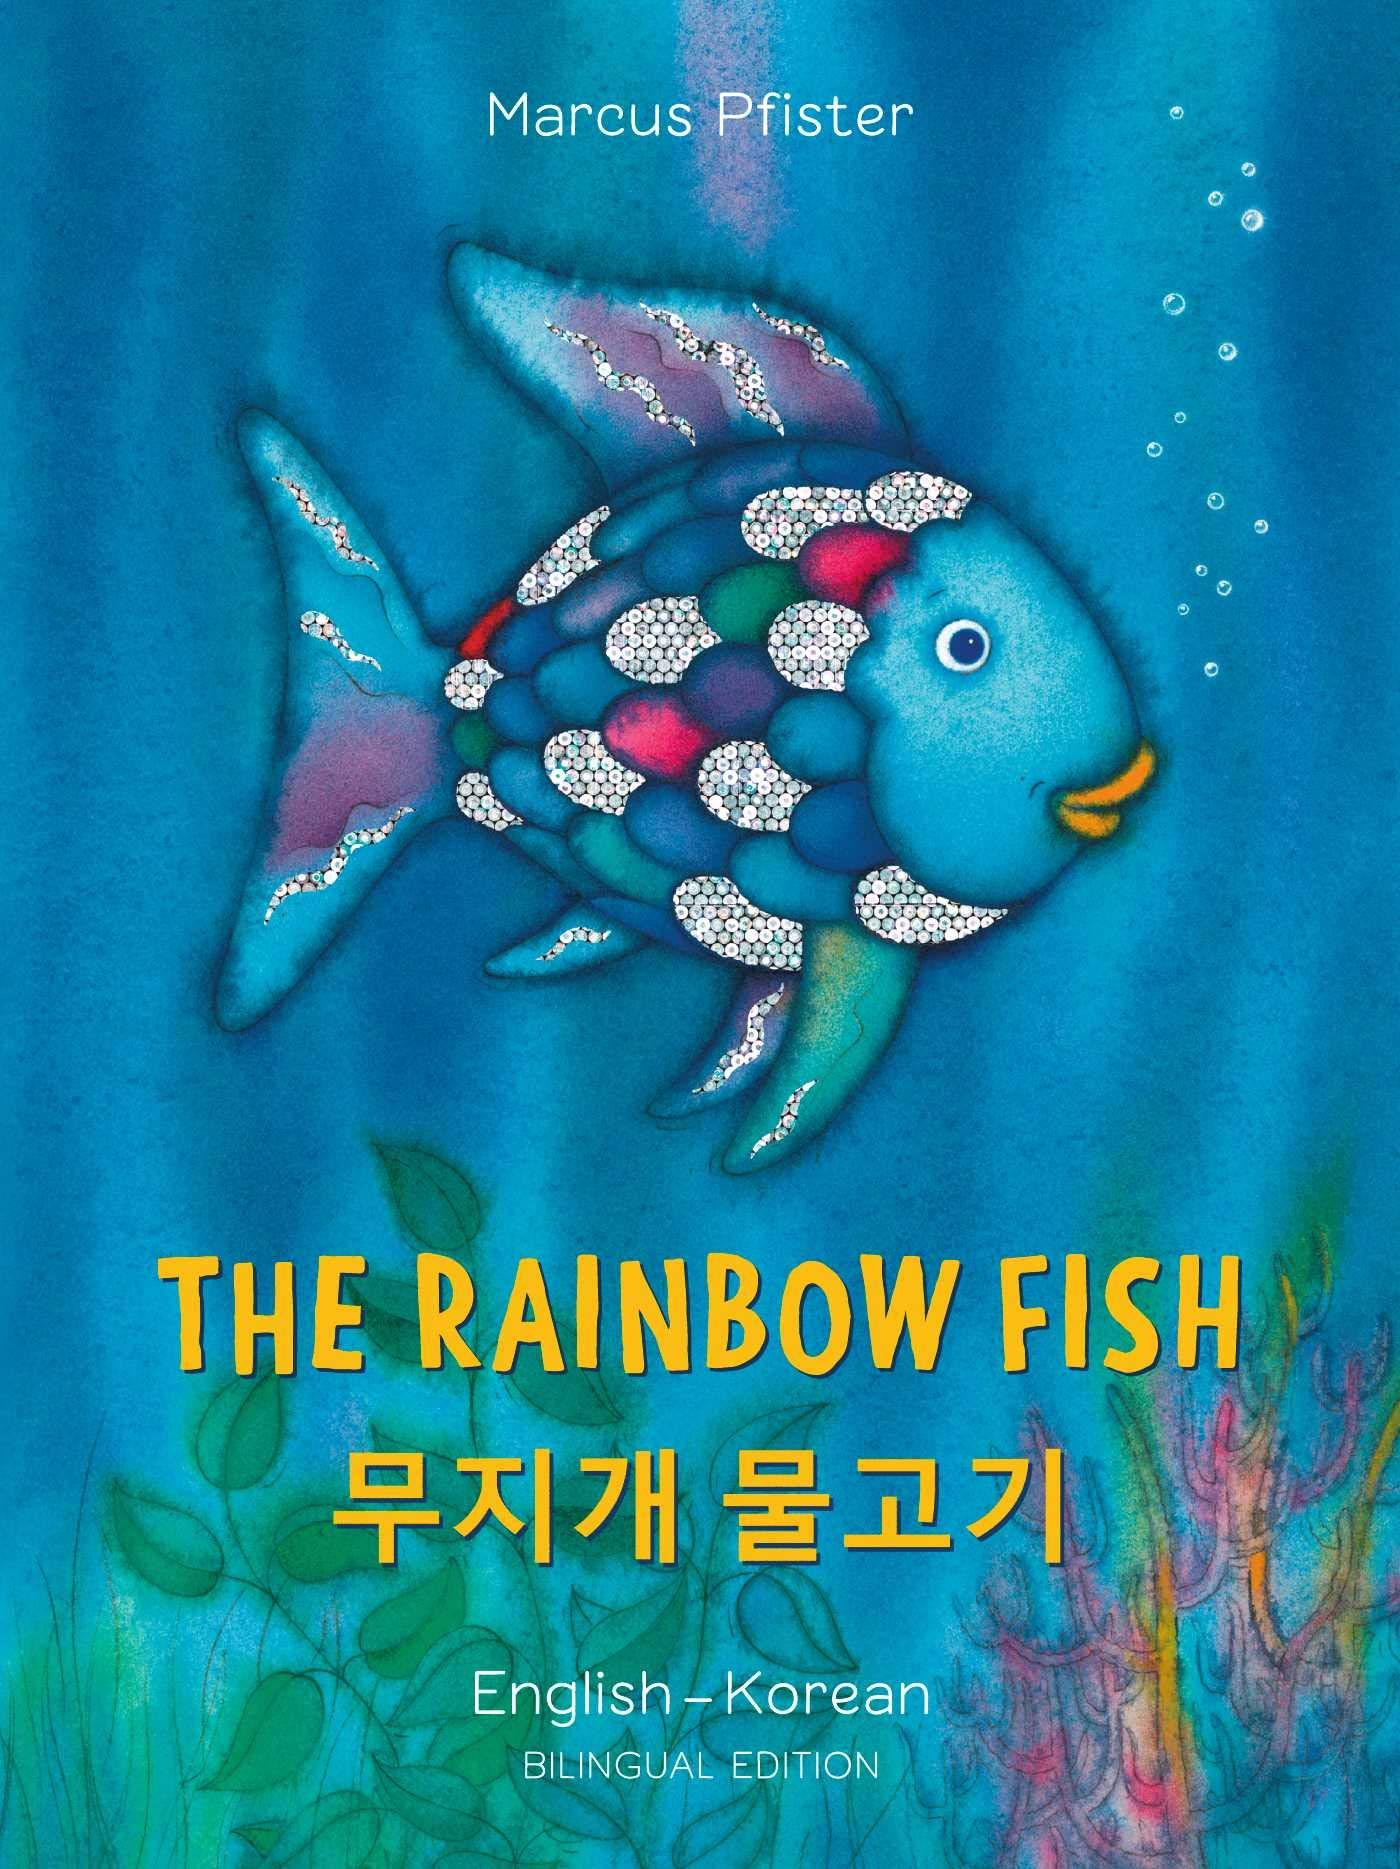 The Rainbow Fish Bi Libri   Eng Korean PB